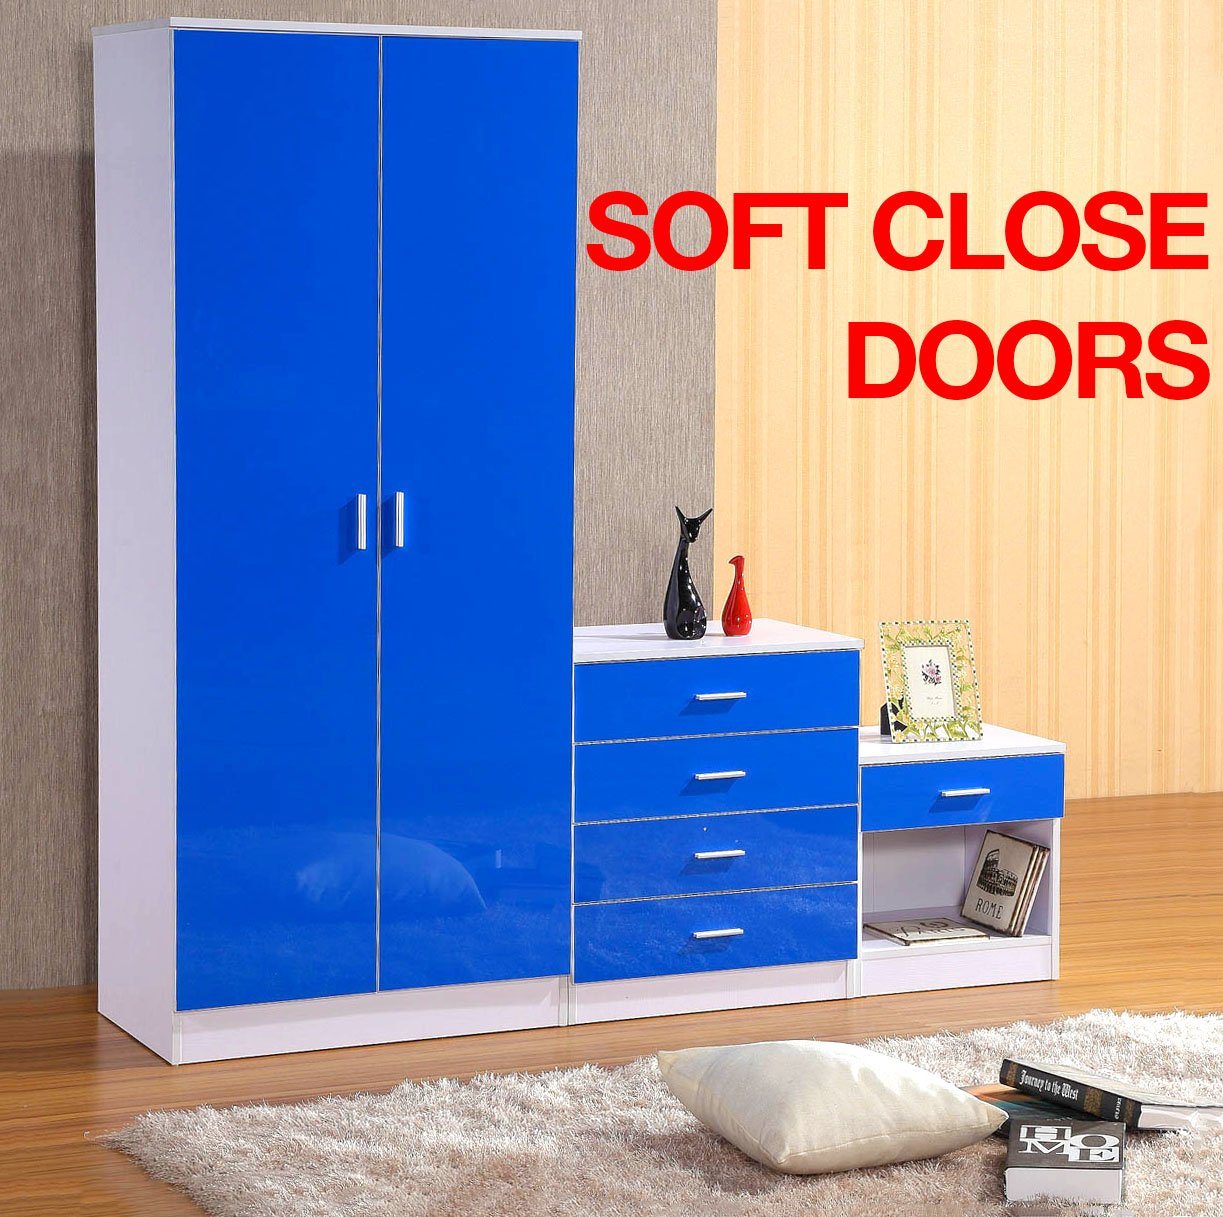 Oak Effect Bedroom Furniture Sets 3 Piece Bedroom Furniture Set Modroxcom